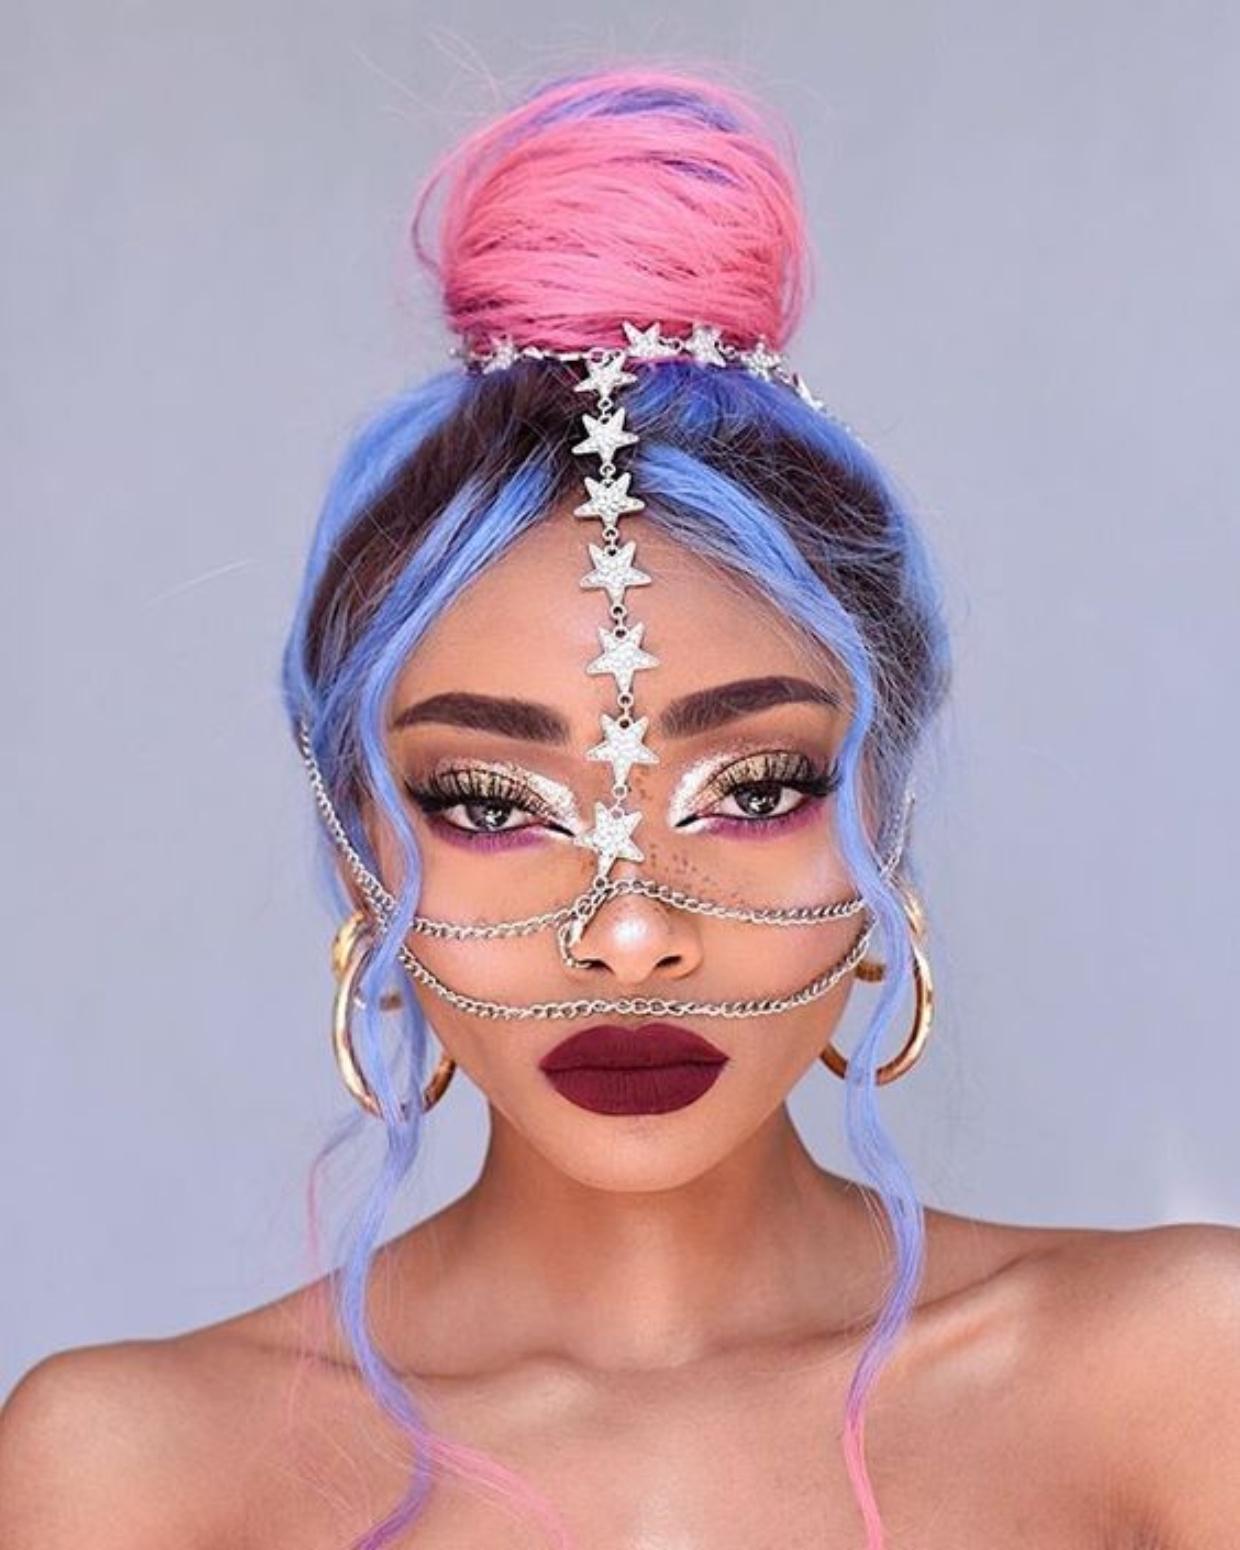 Tri-Colour Hair with Classic Bun Hairstyle and Rhinestone Face Chain